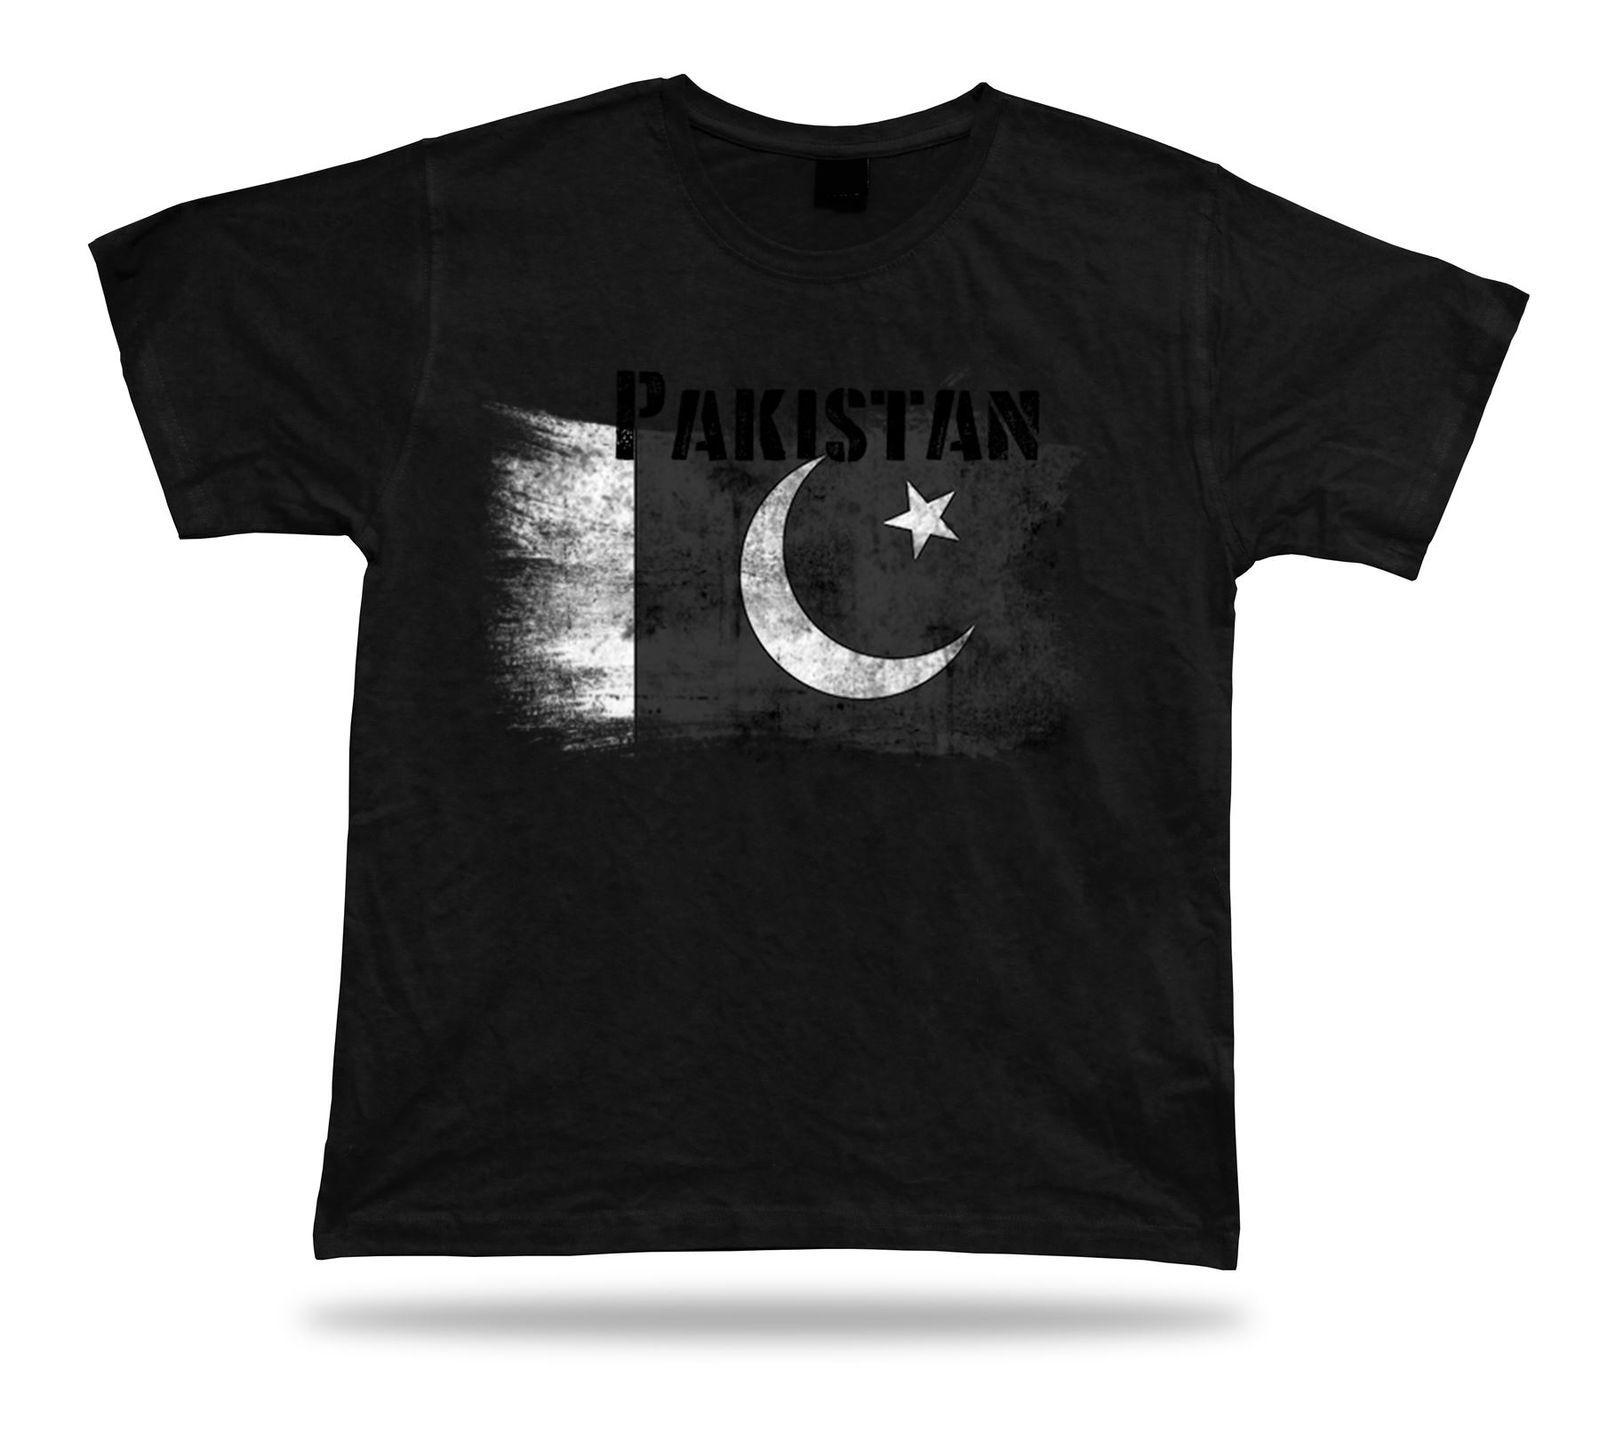 Pakistan flag Tshirt T-shirt Tee top city map Muslim League Mughal art  tricot 2018 New Leisure Fashion t-Shirt men